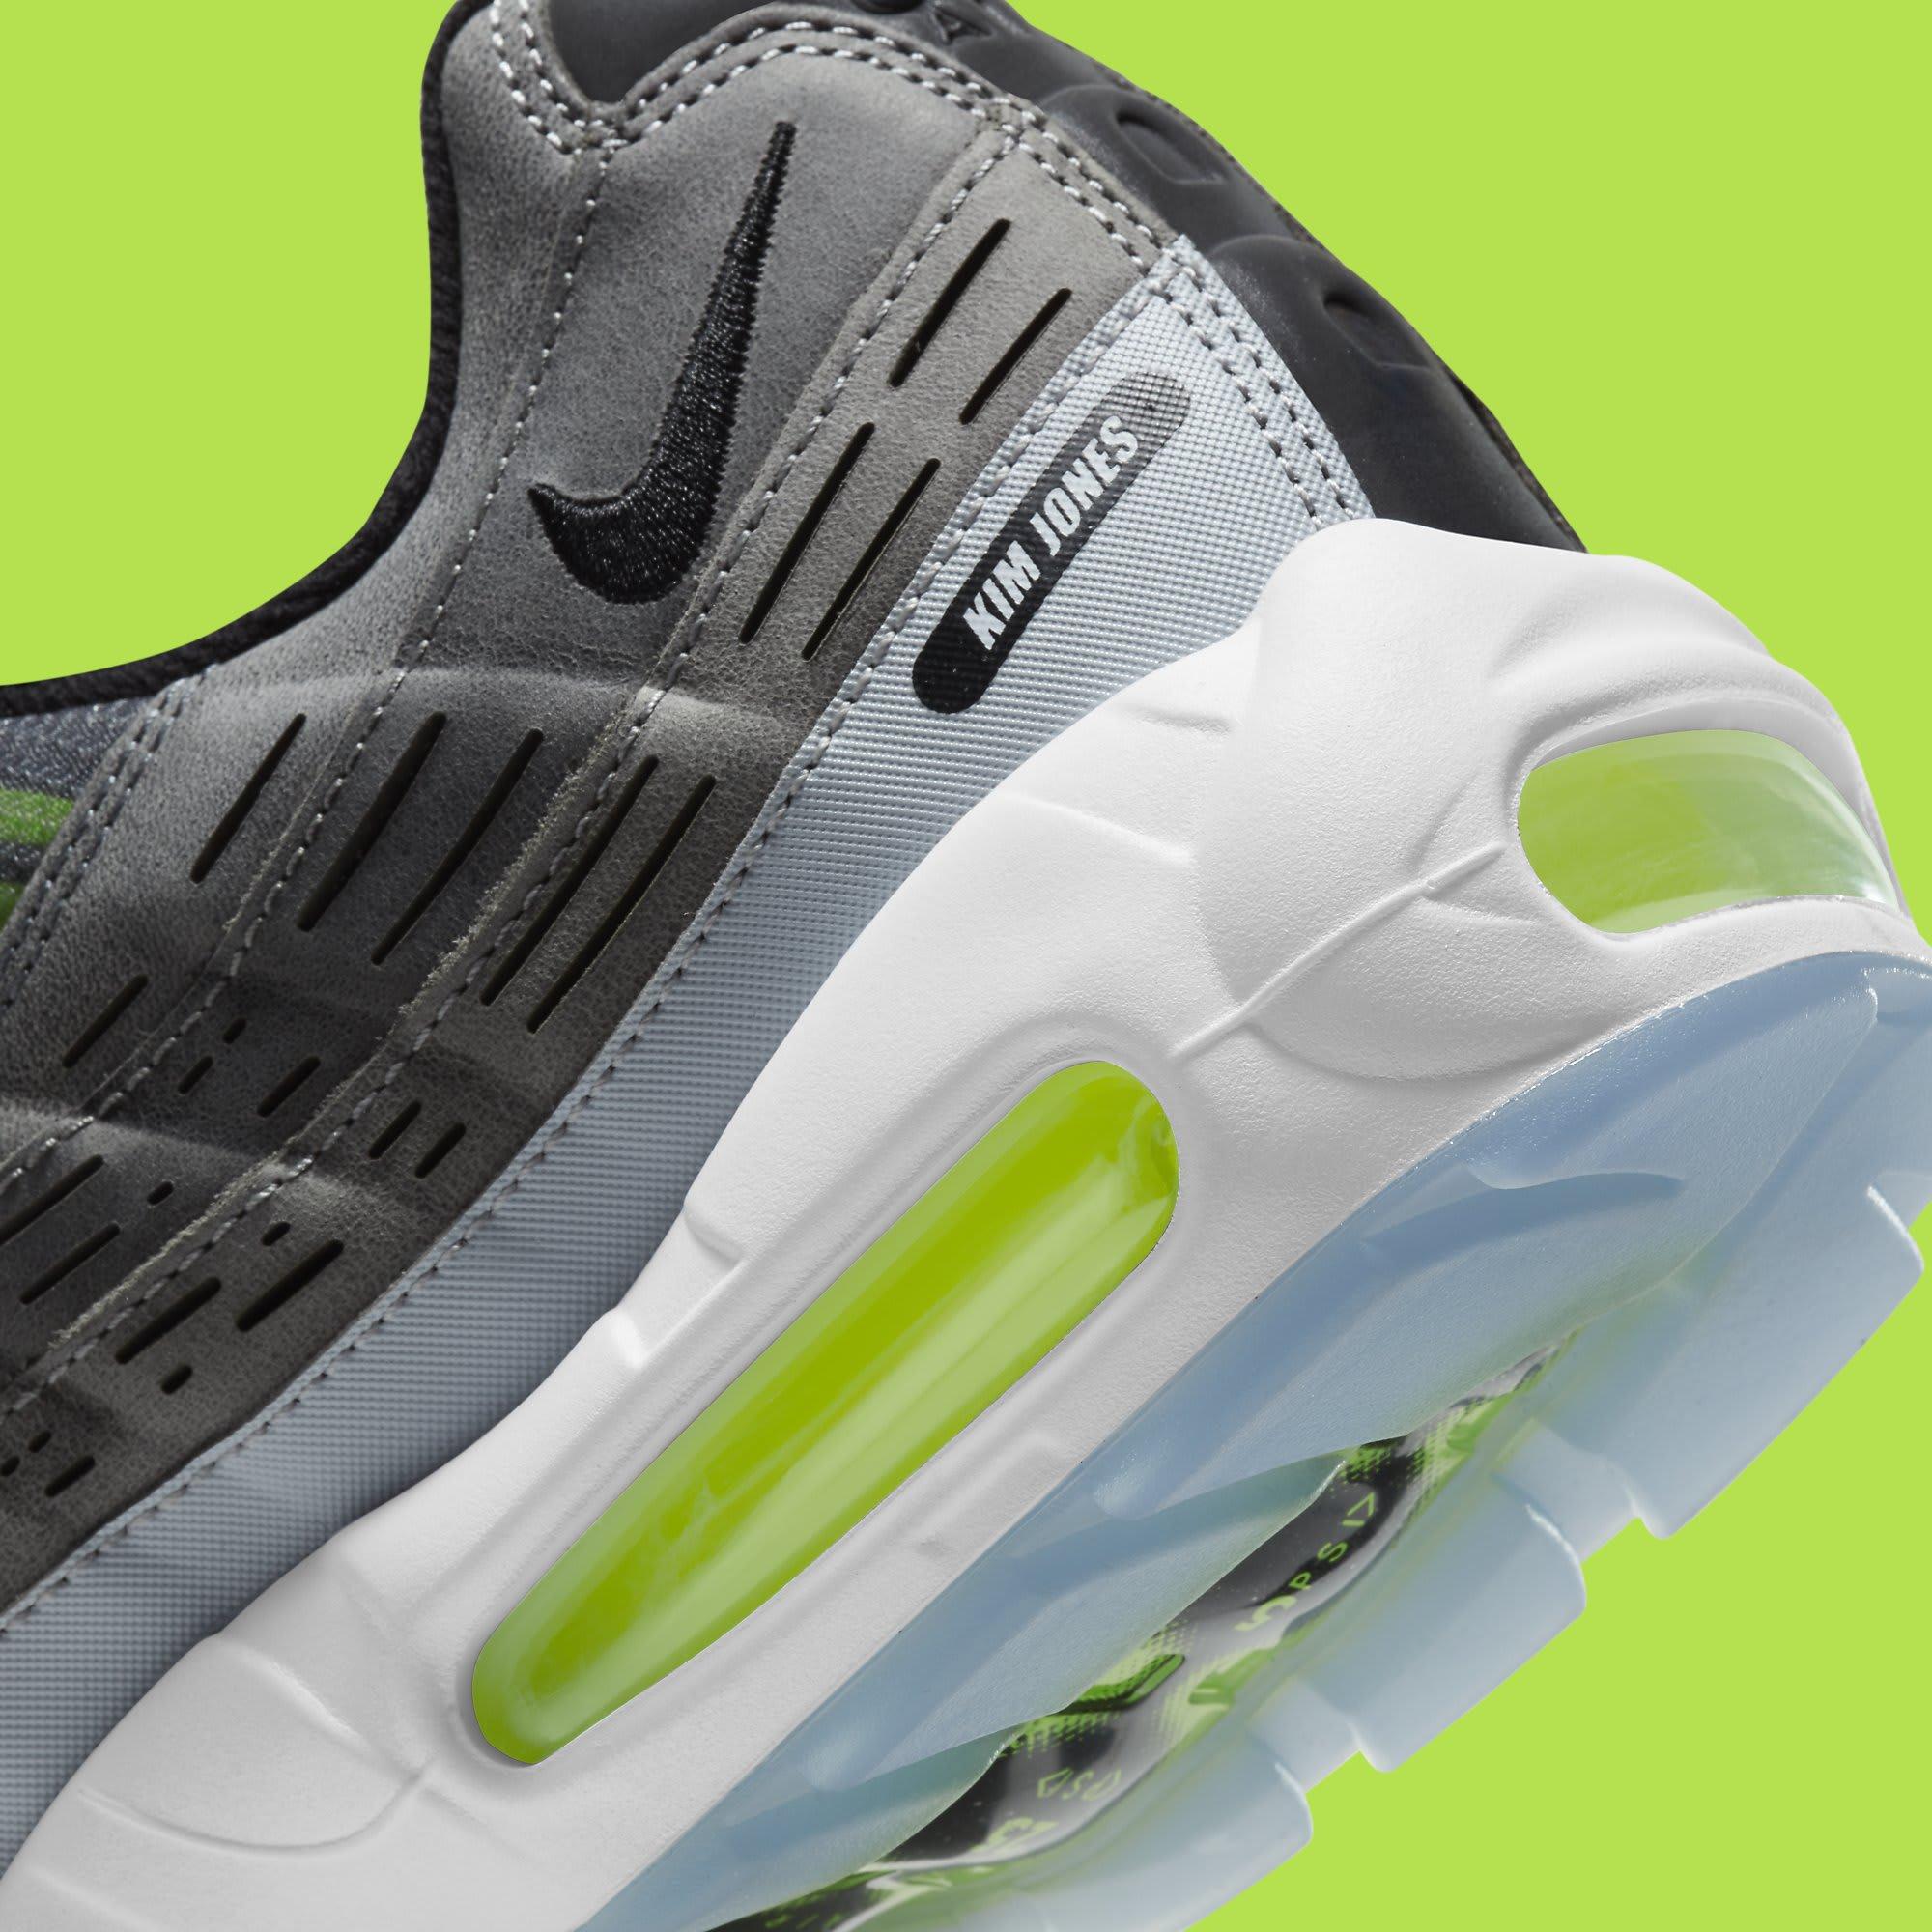 Kim Jones x Nike Air Max 95 Volt Release Date DD1871-002 Heel Detail